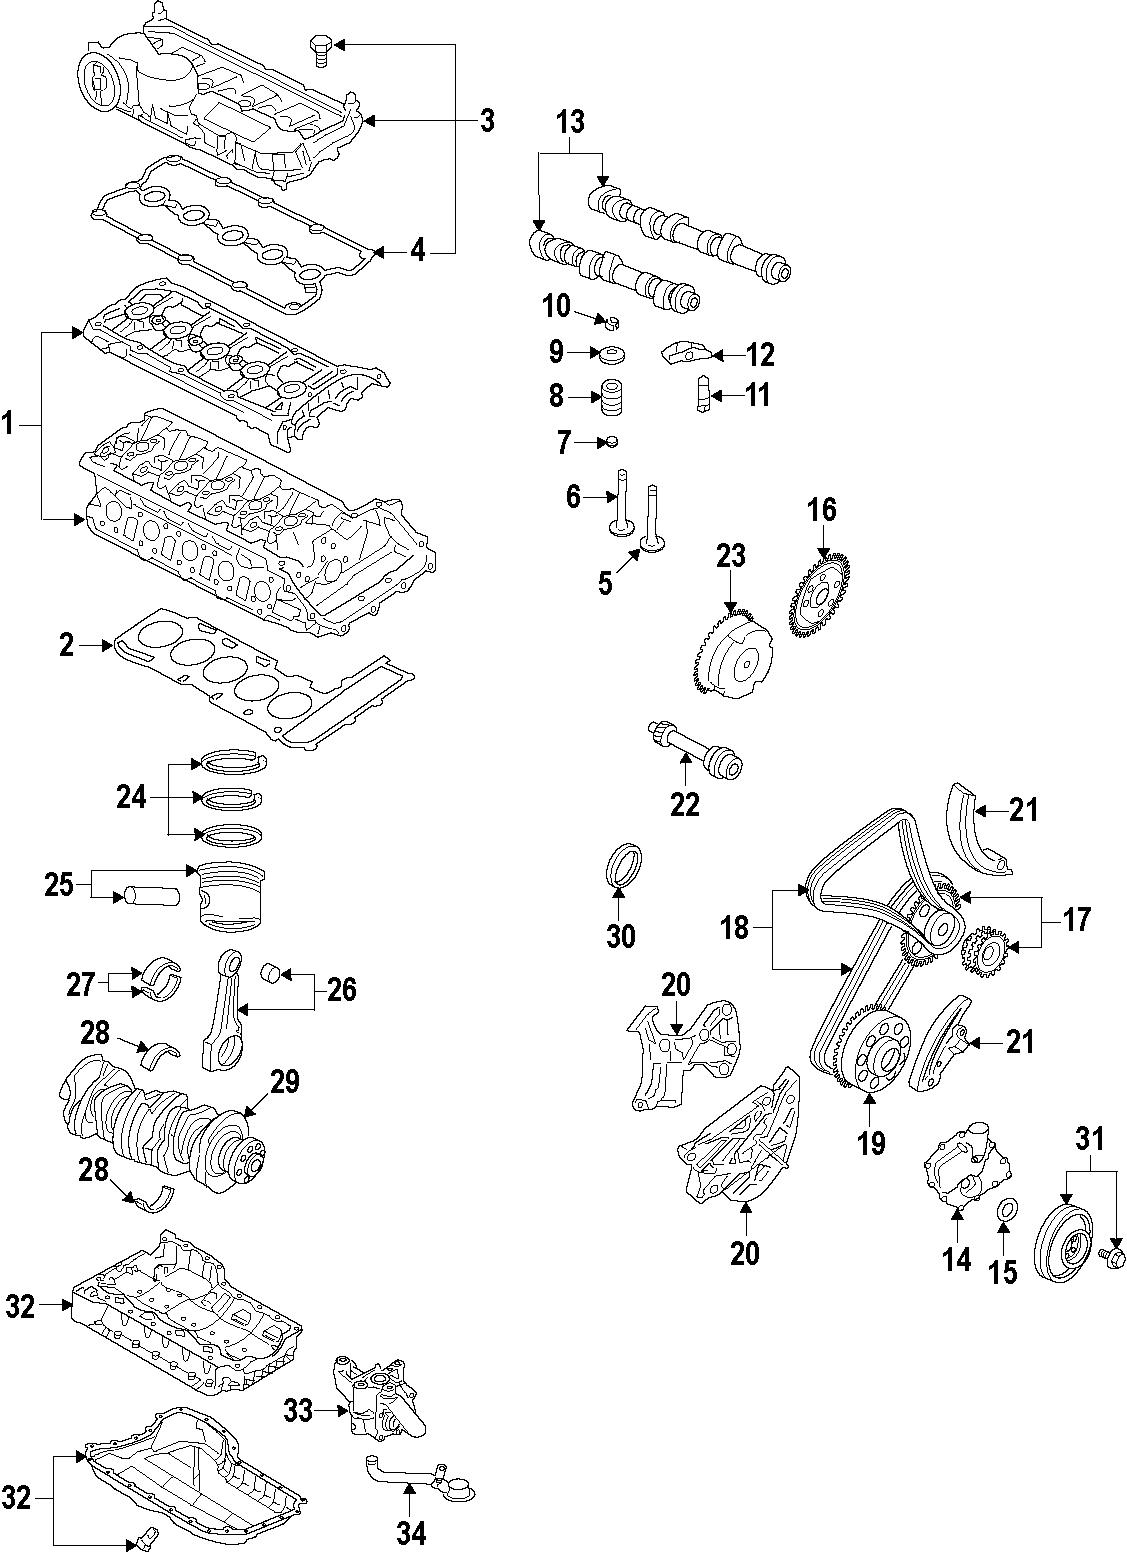 Volkswagen Beetle Engine Crankshaft Main Bearing. Lower